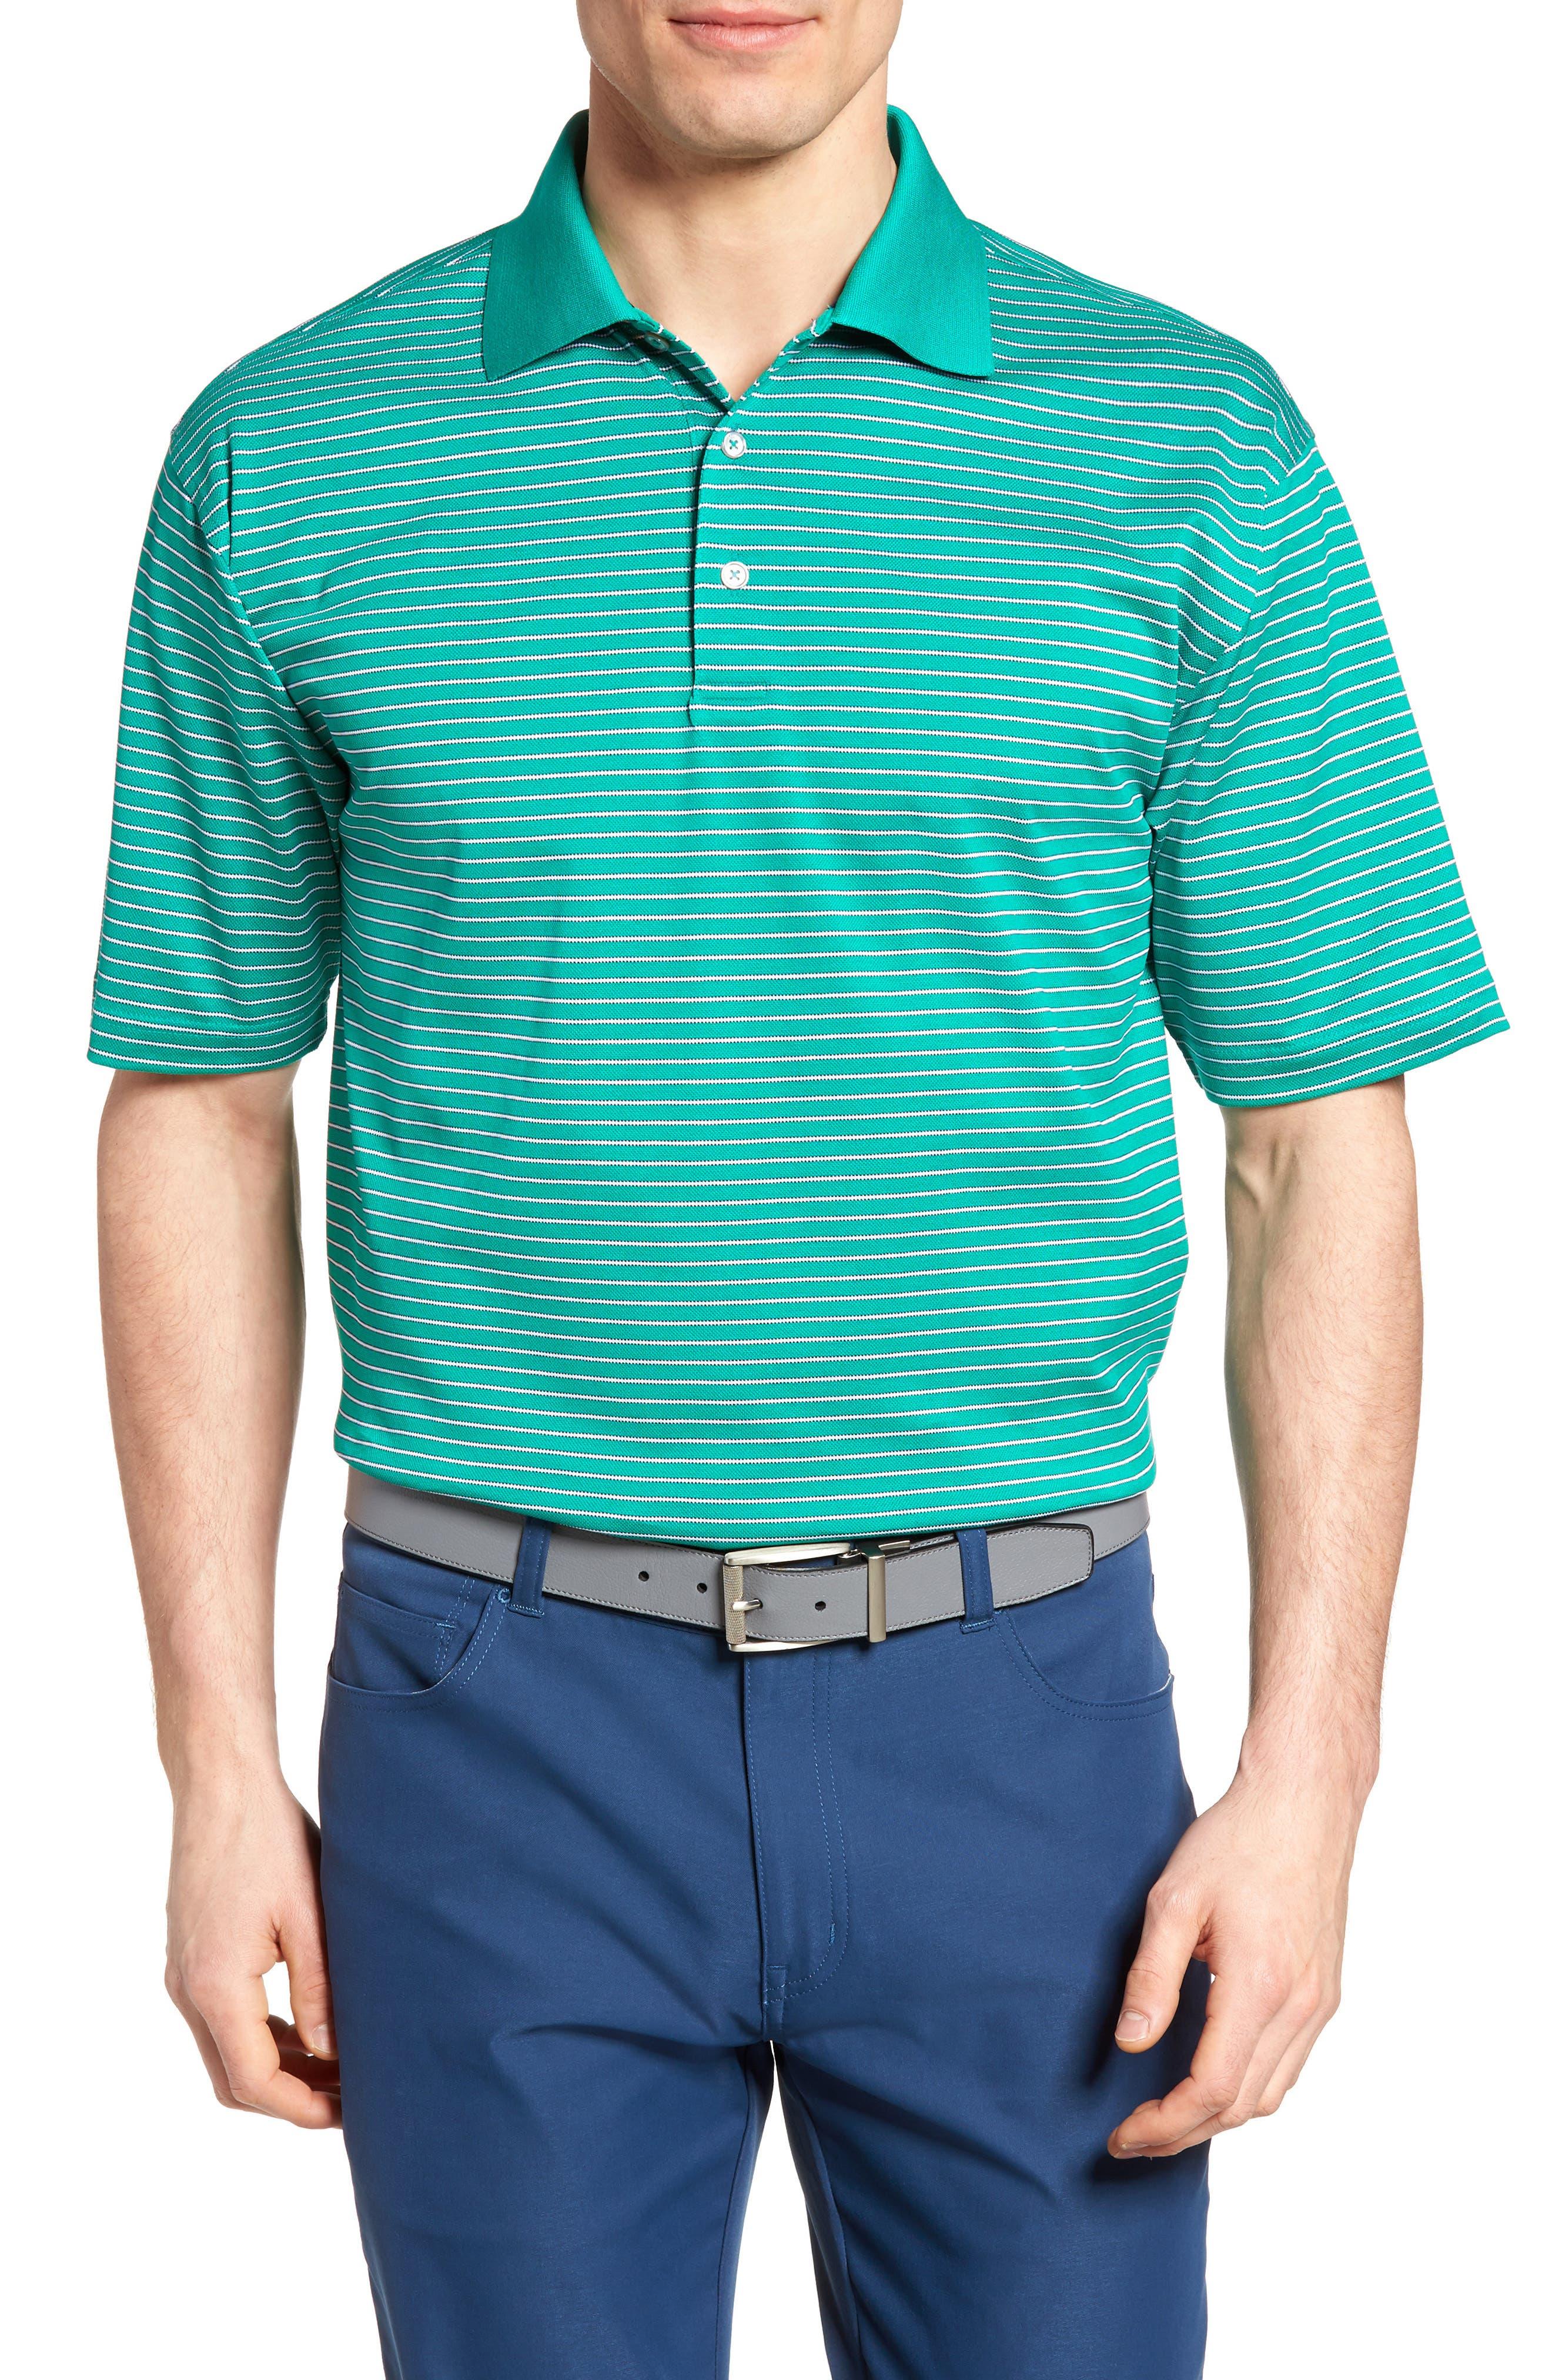 Bobby Jones Dot Stripe Golf Polo